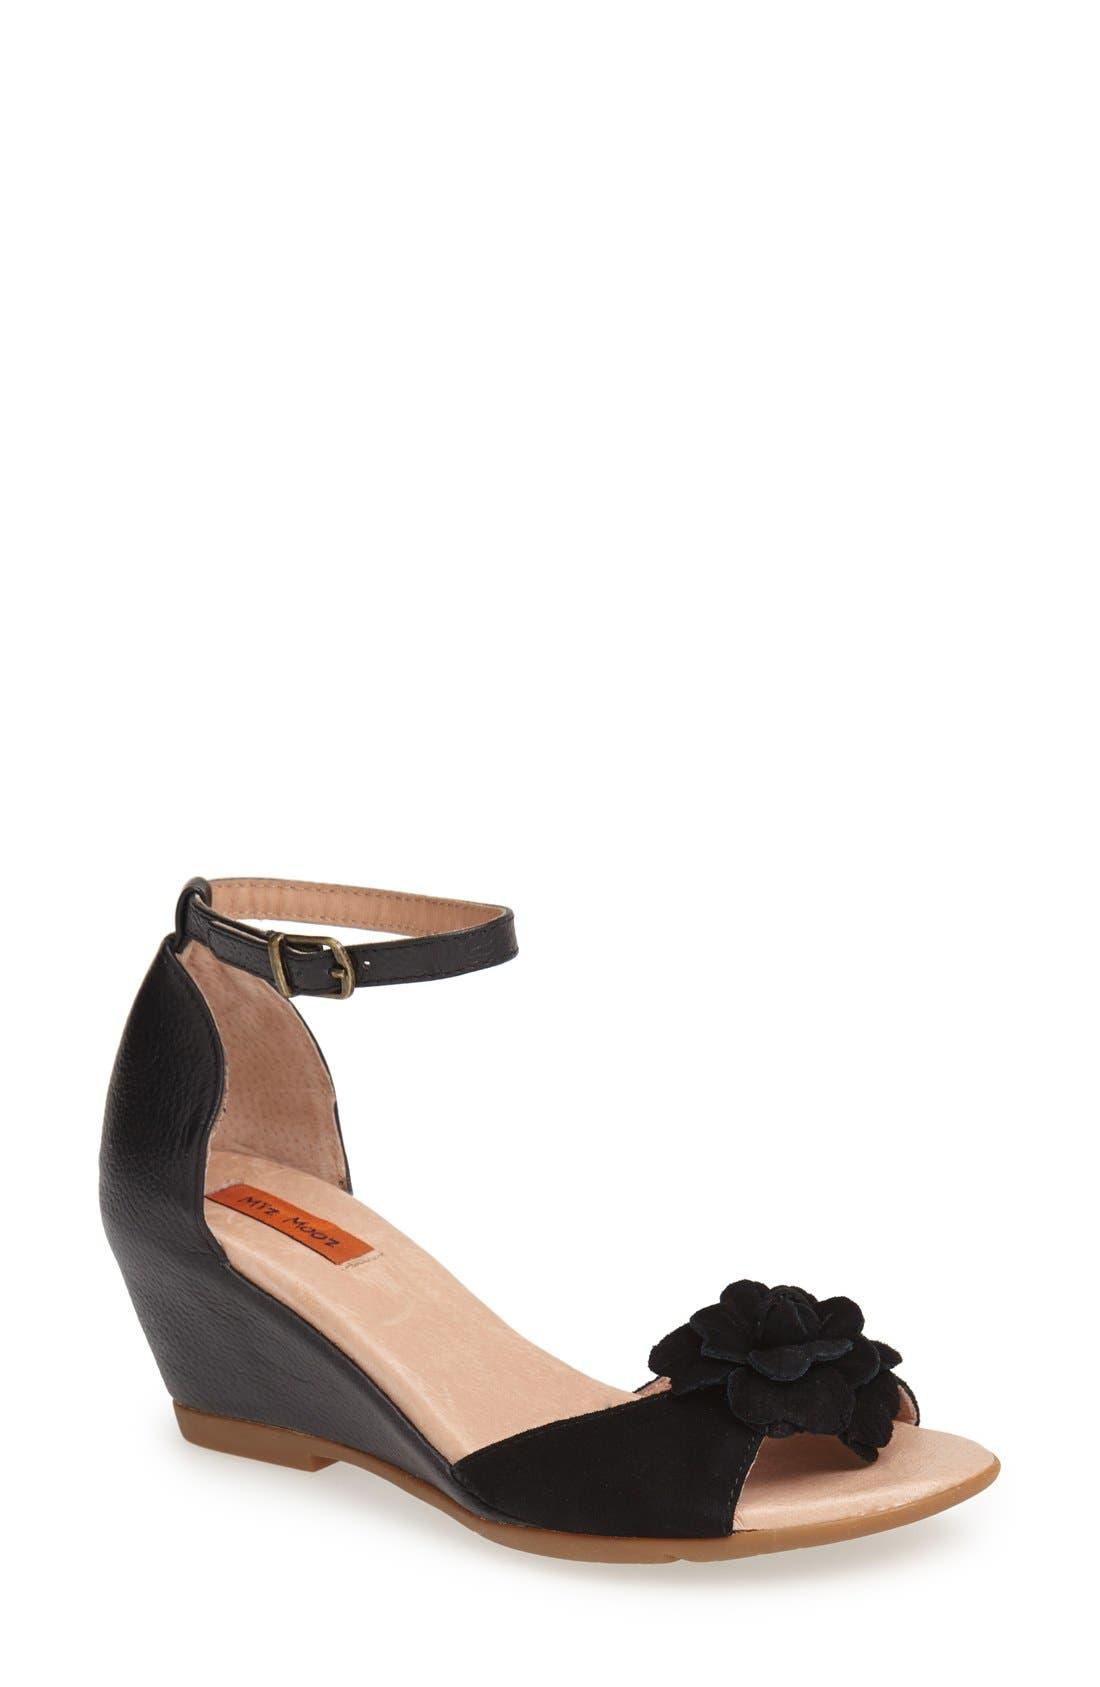 Alternate Image 1 Selected - Miz Mooz 'Carmen' Leather Wedge Sandal (Women)(Special Purchase)